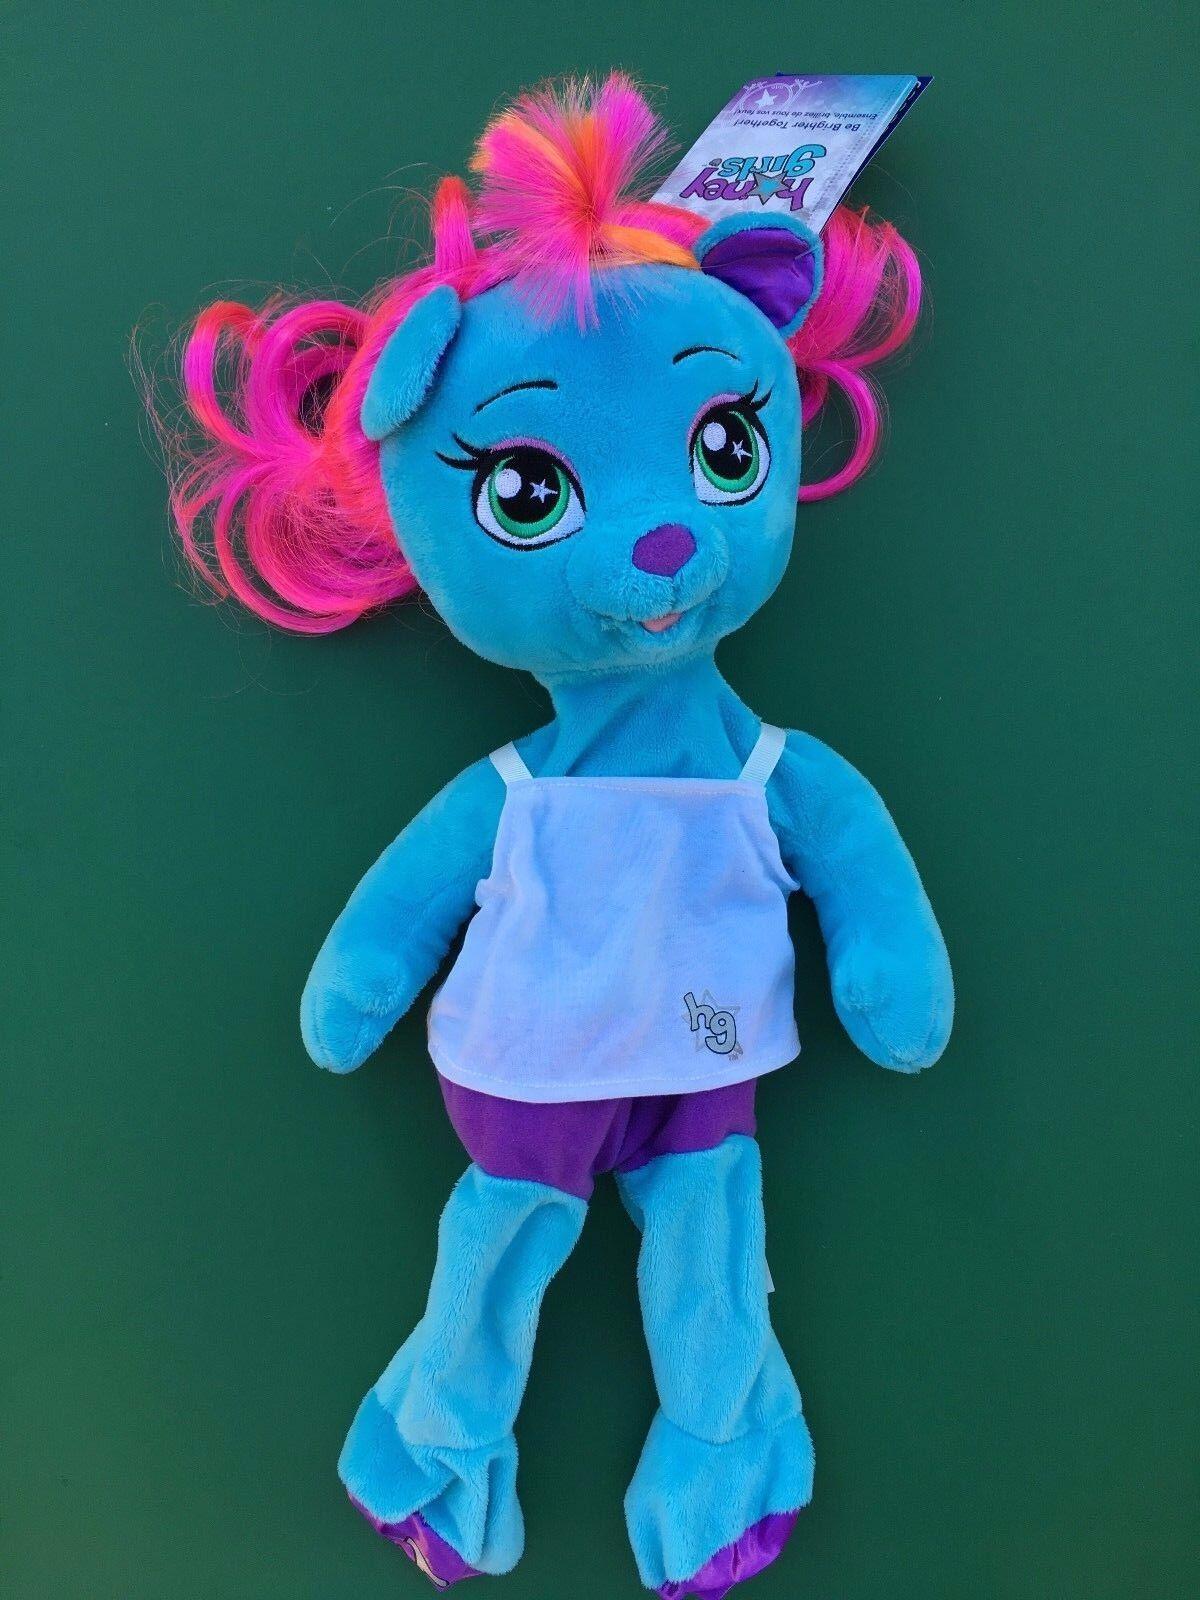 Build a Bear Teddy Bear Honey Girls Viv Plush Toy - Unstuffed - NWT